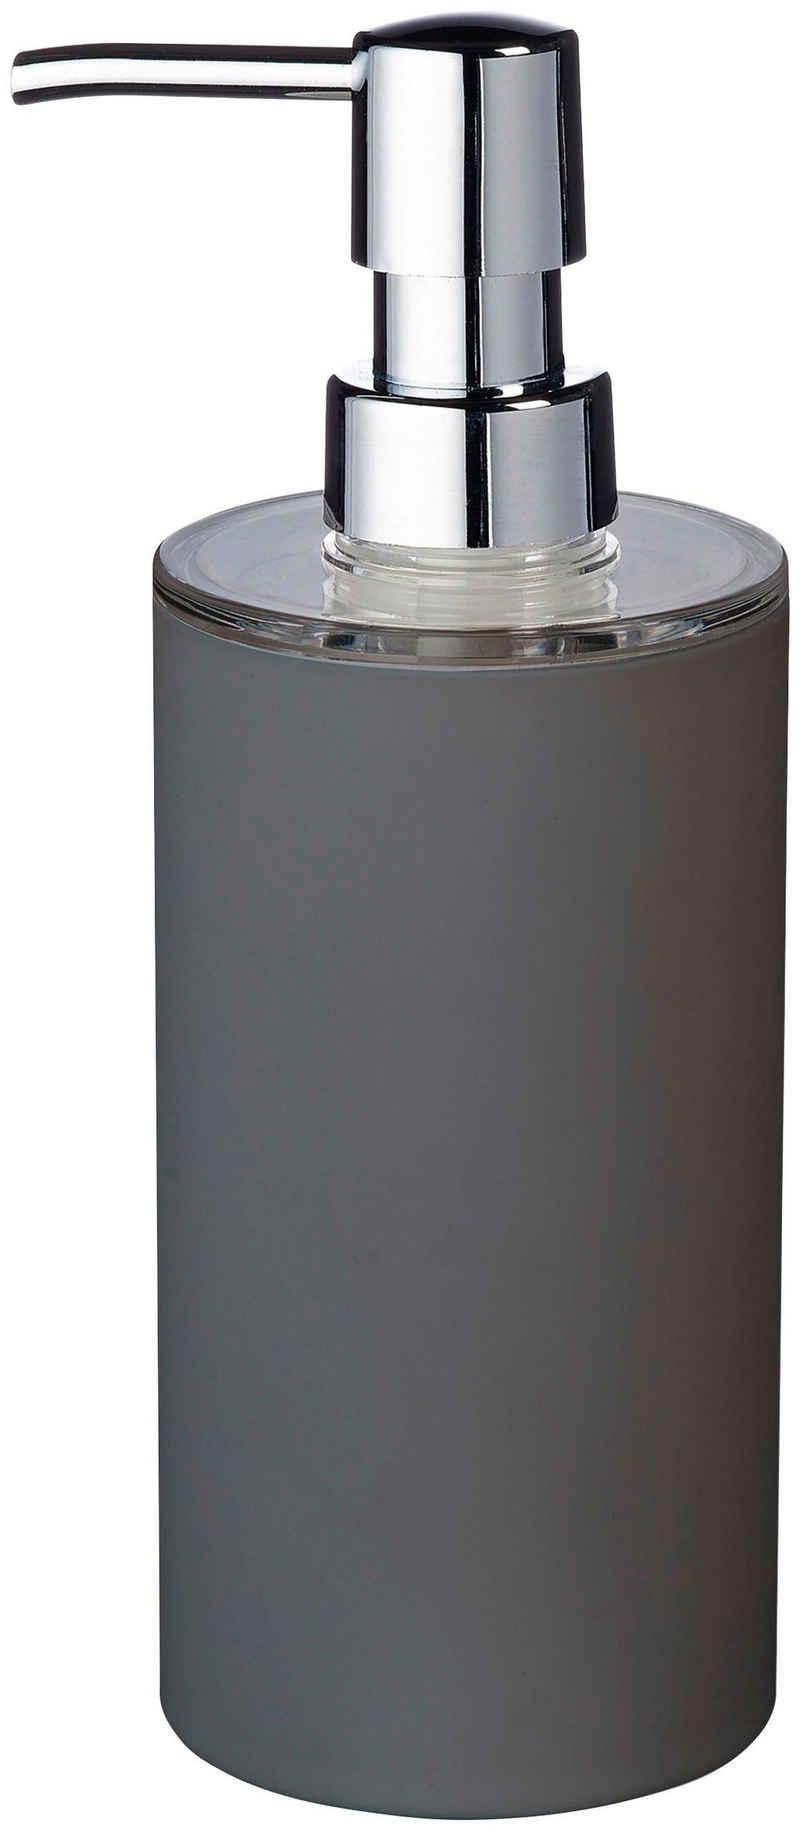 Ridder Seifenspender »Touch«, 340 ml